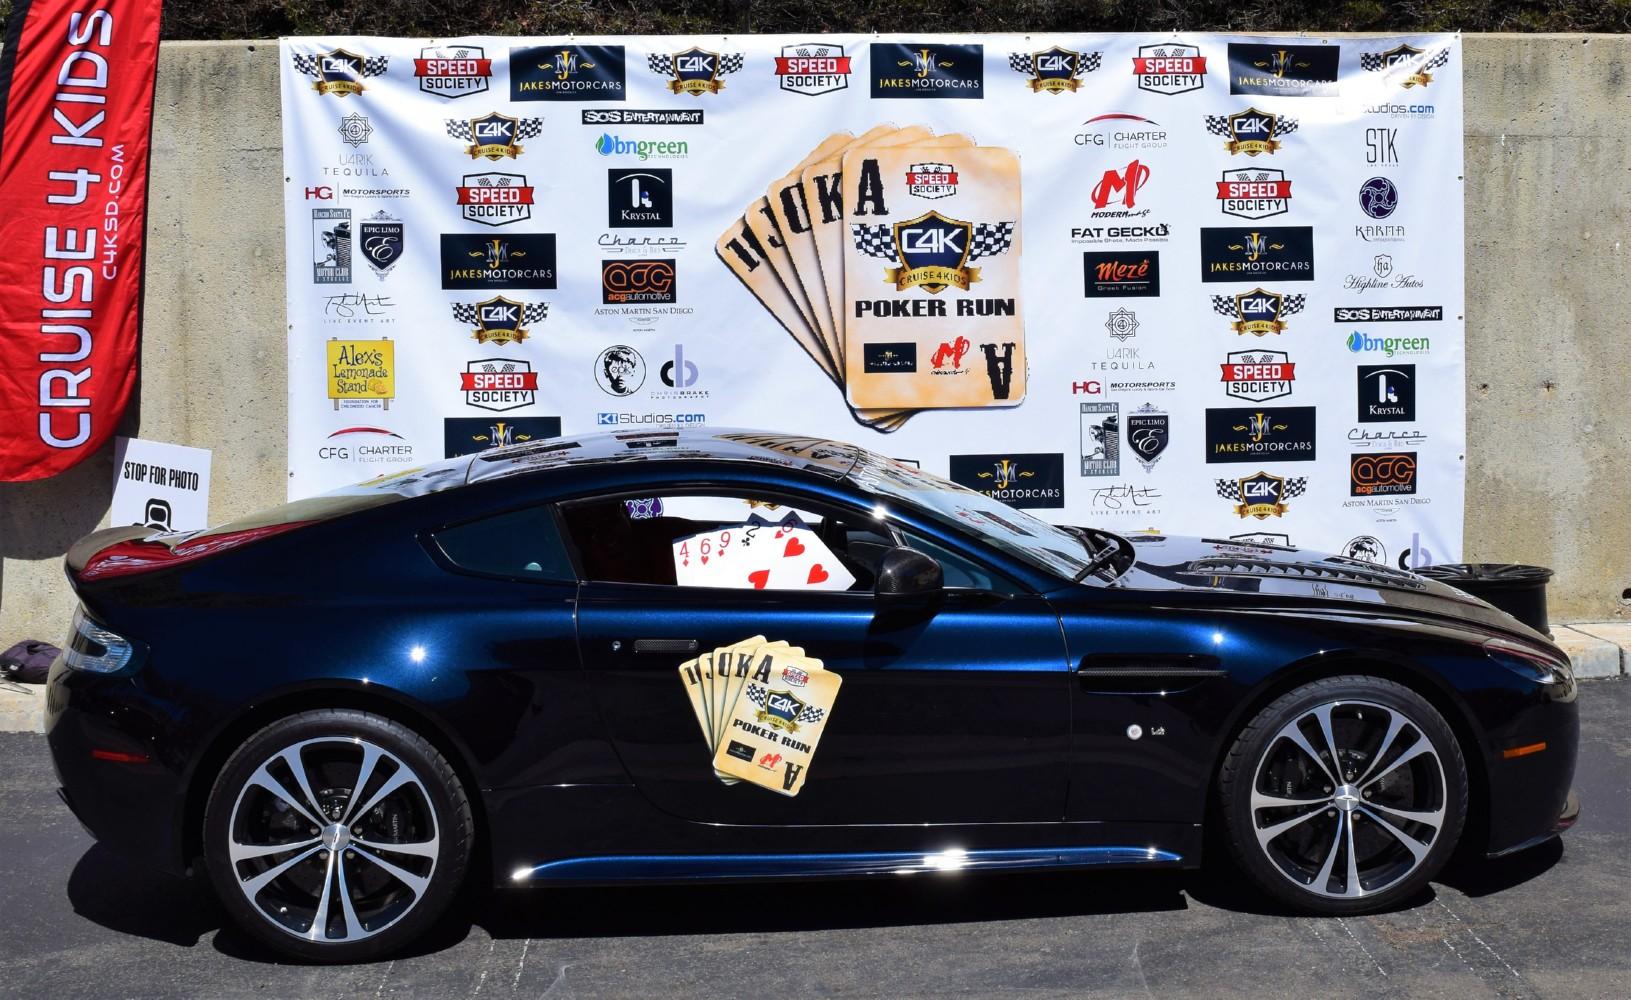 Poker Run 2017 Banner Photos - 54.jpg